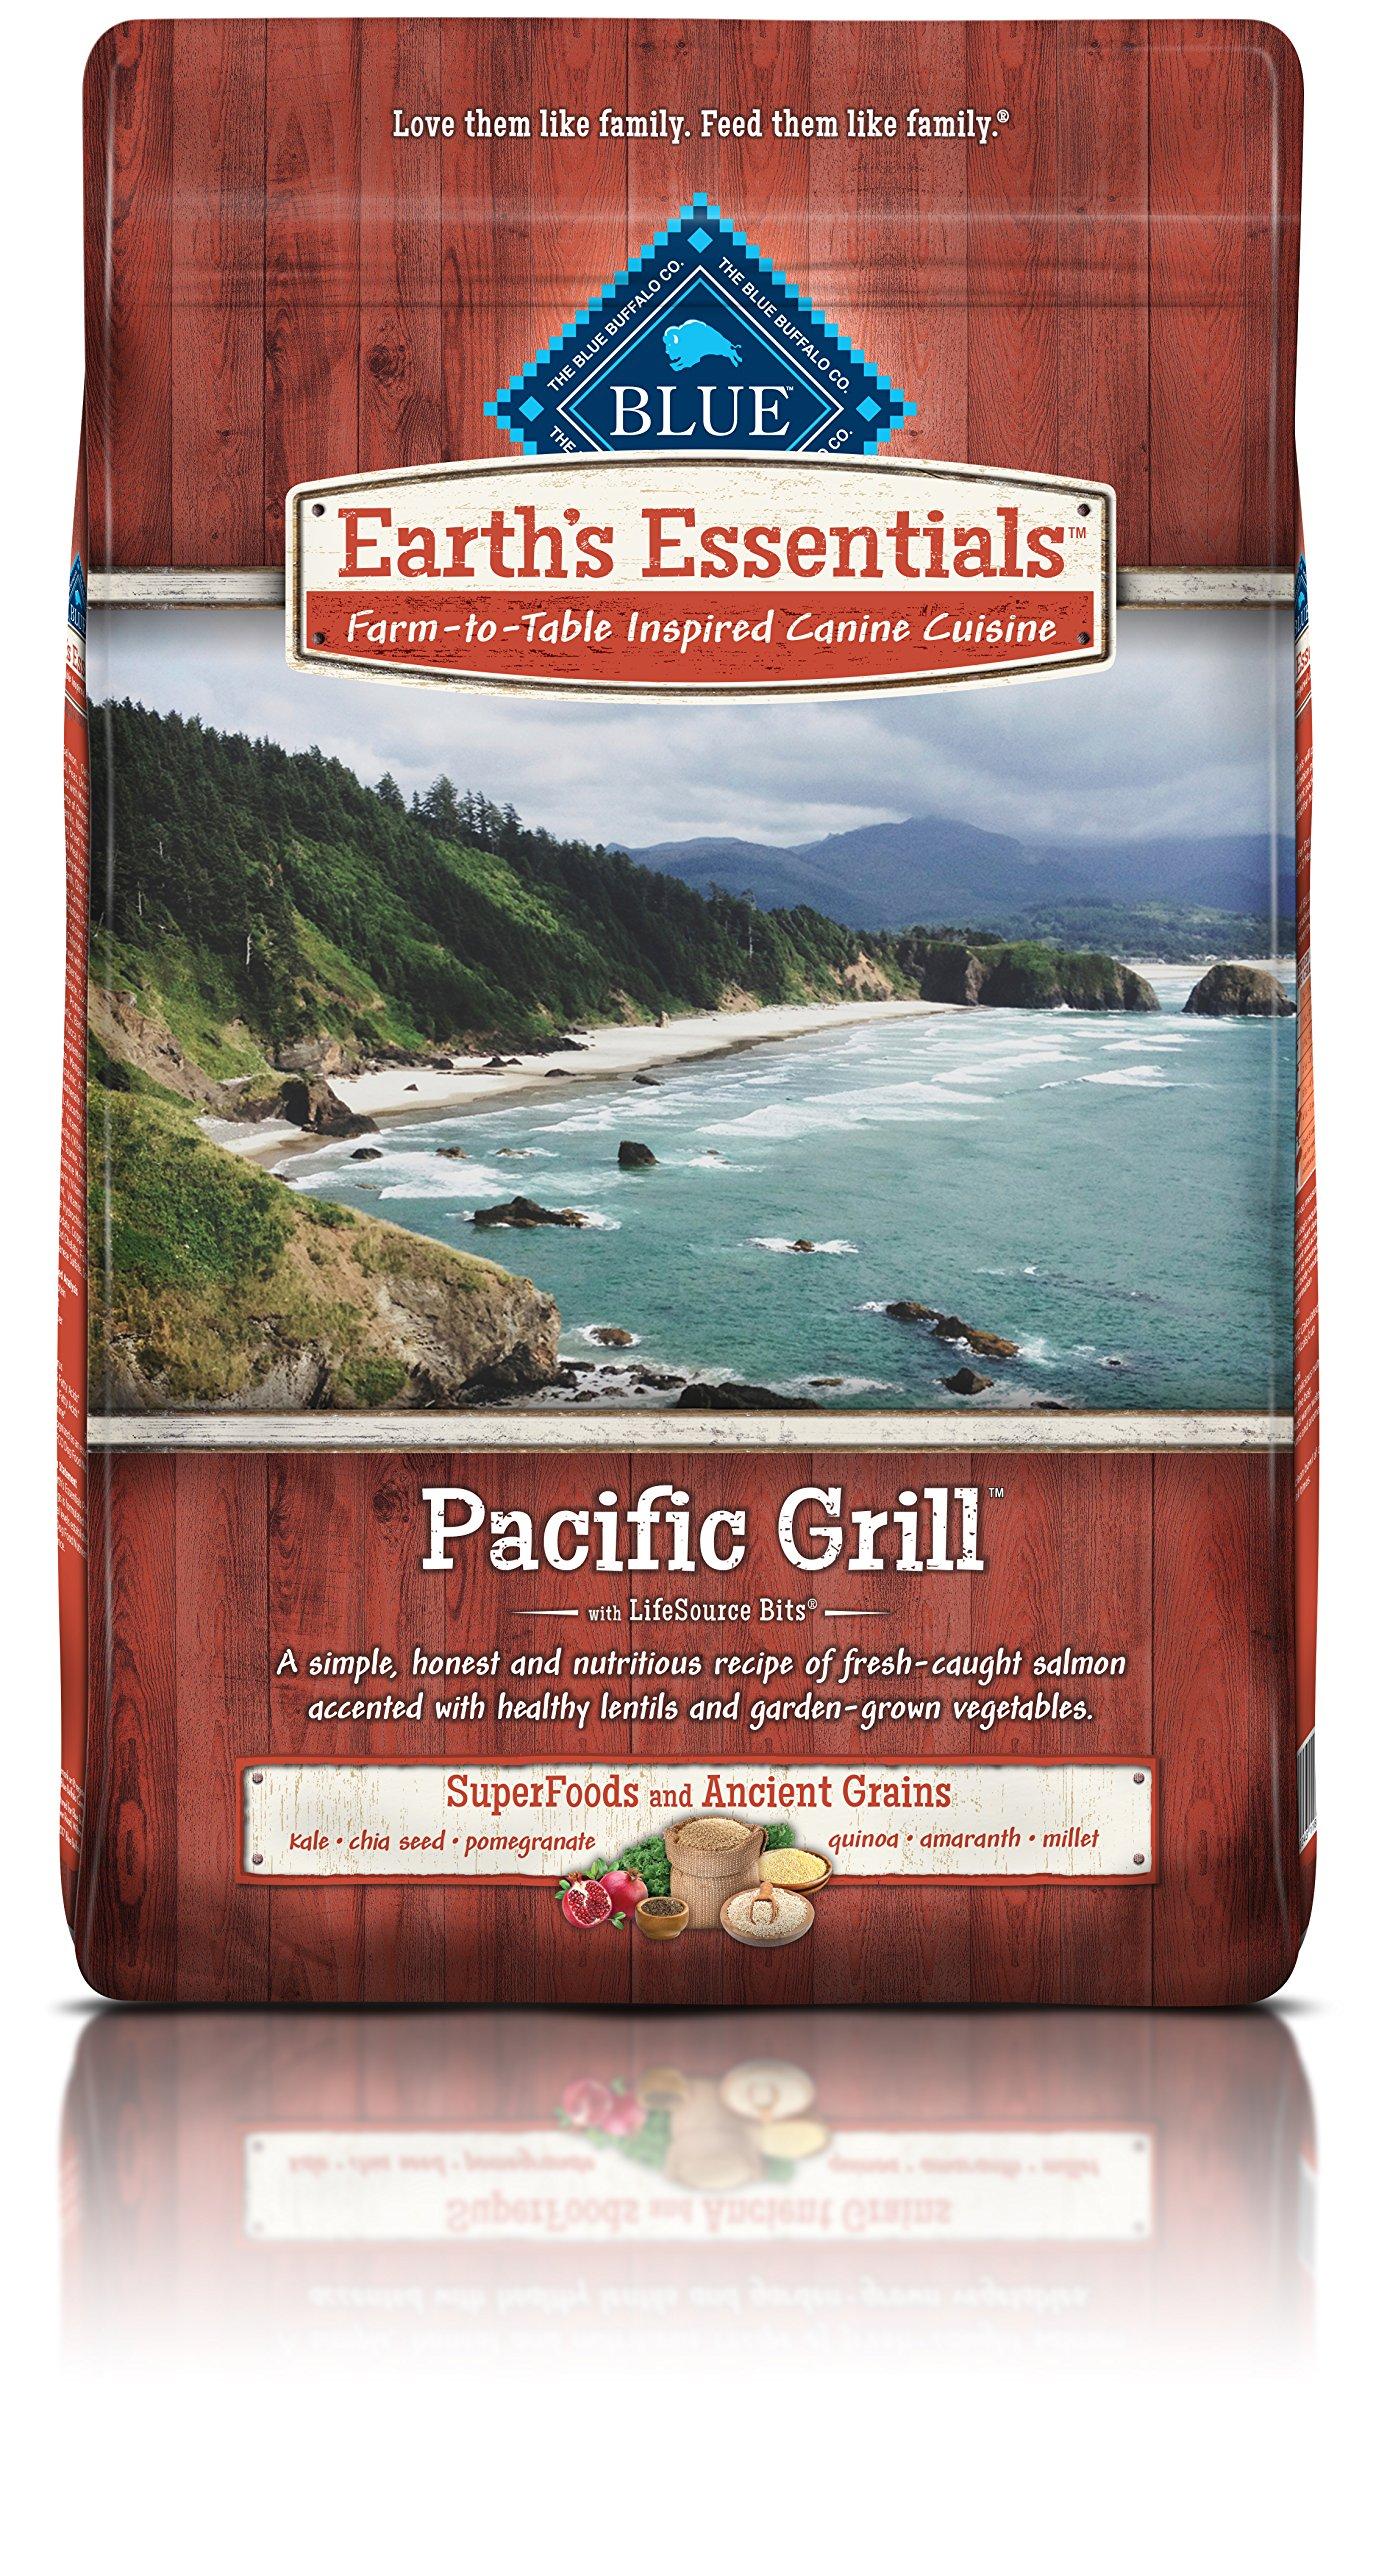 BLUE Earth's Essentials Pacific Grill Salmon & Lentils, 22 lb